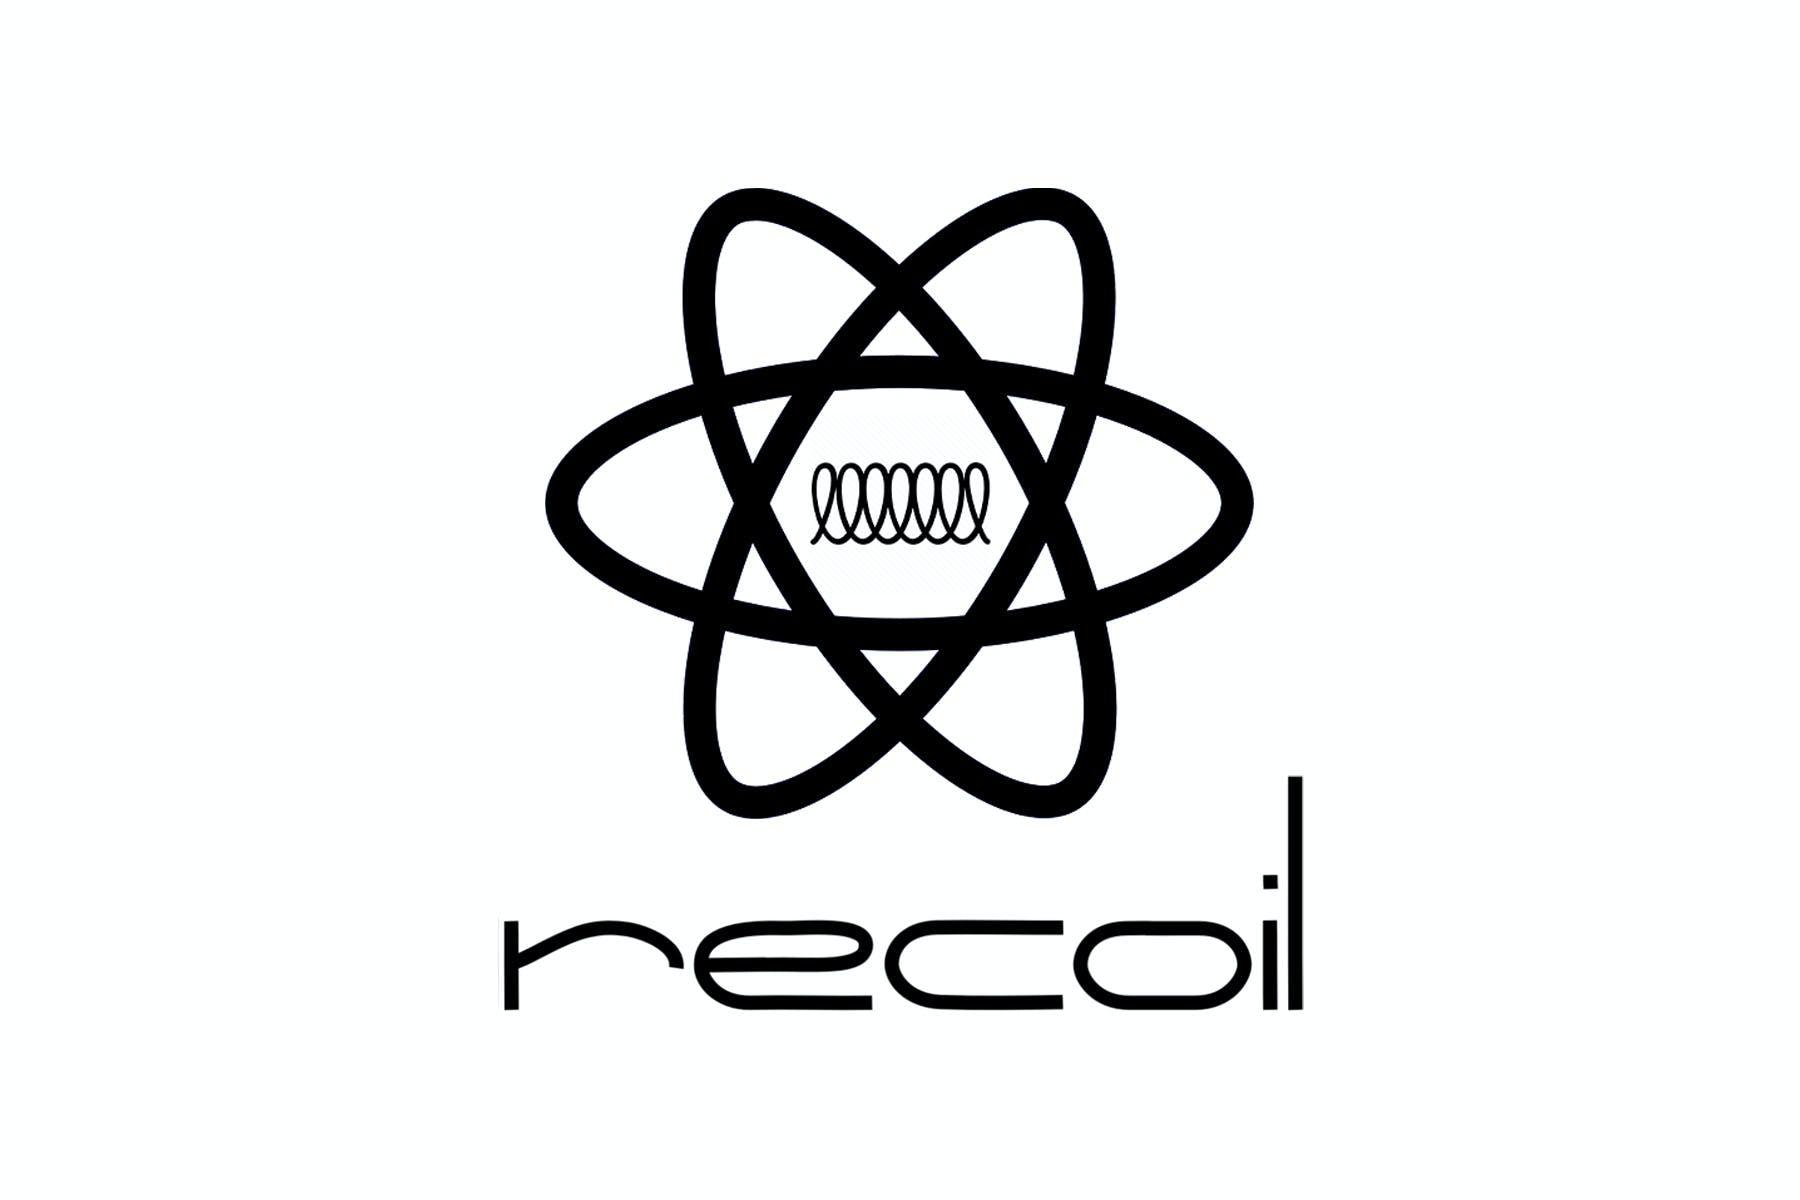 React Recoil logo - fan-made unofficial